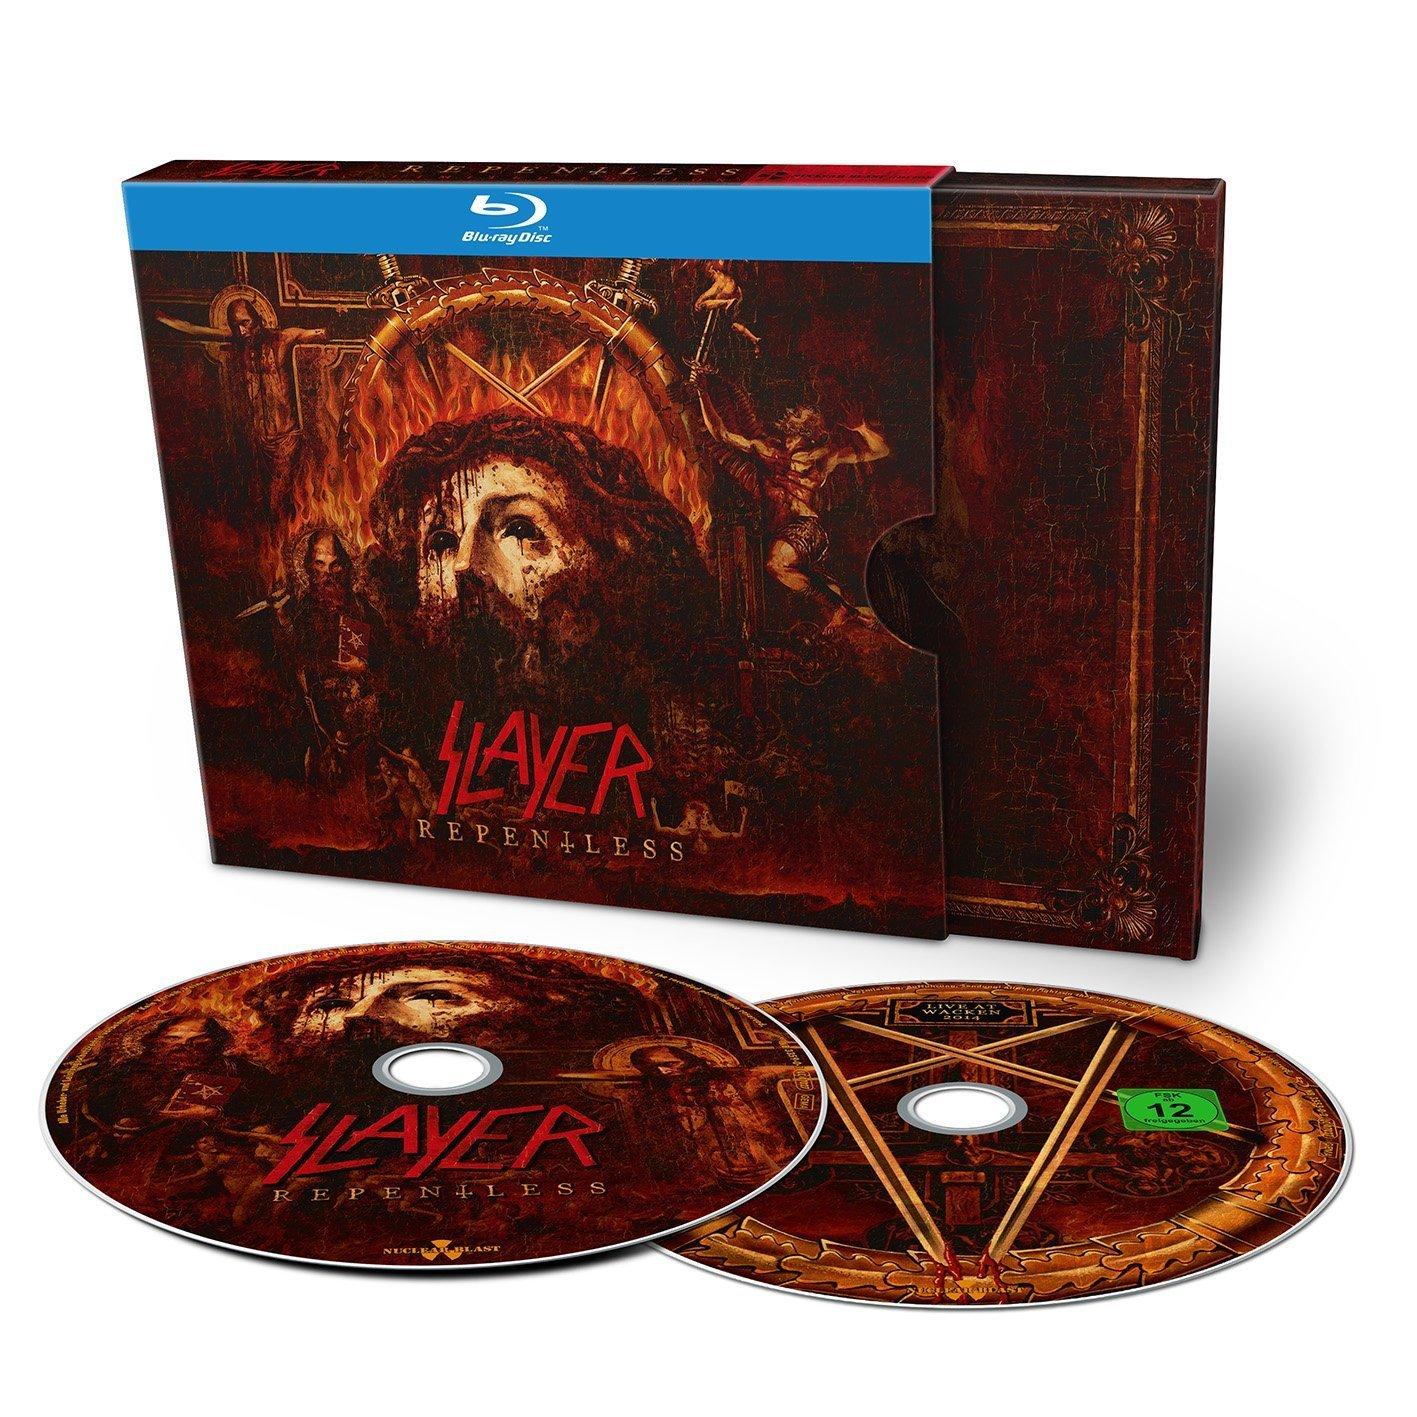 Slayer Repentless Live At Wacken (2014) 720p+1080p MBluRay x264-TREBLE